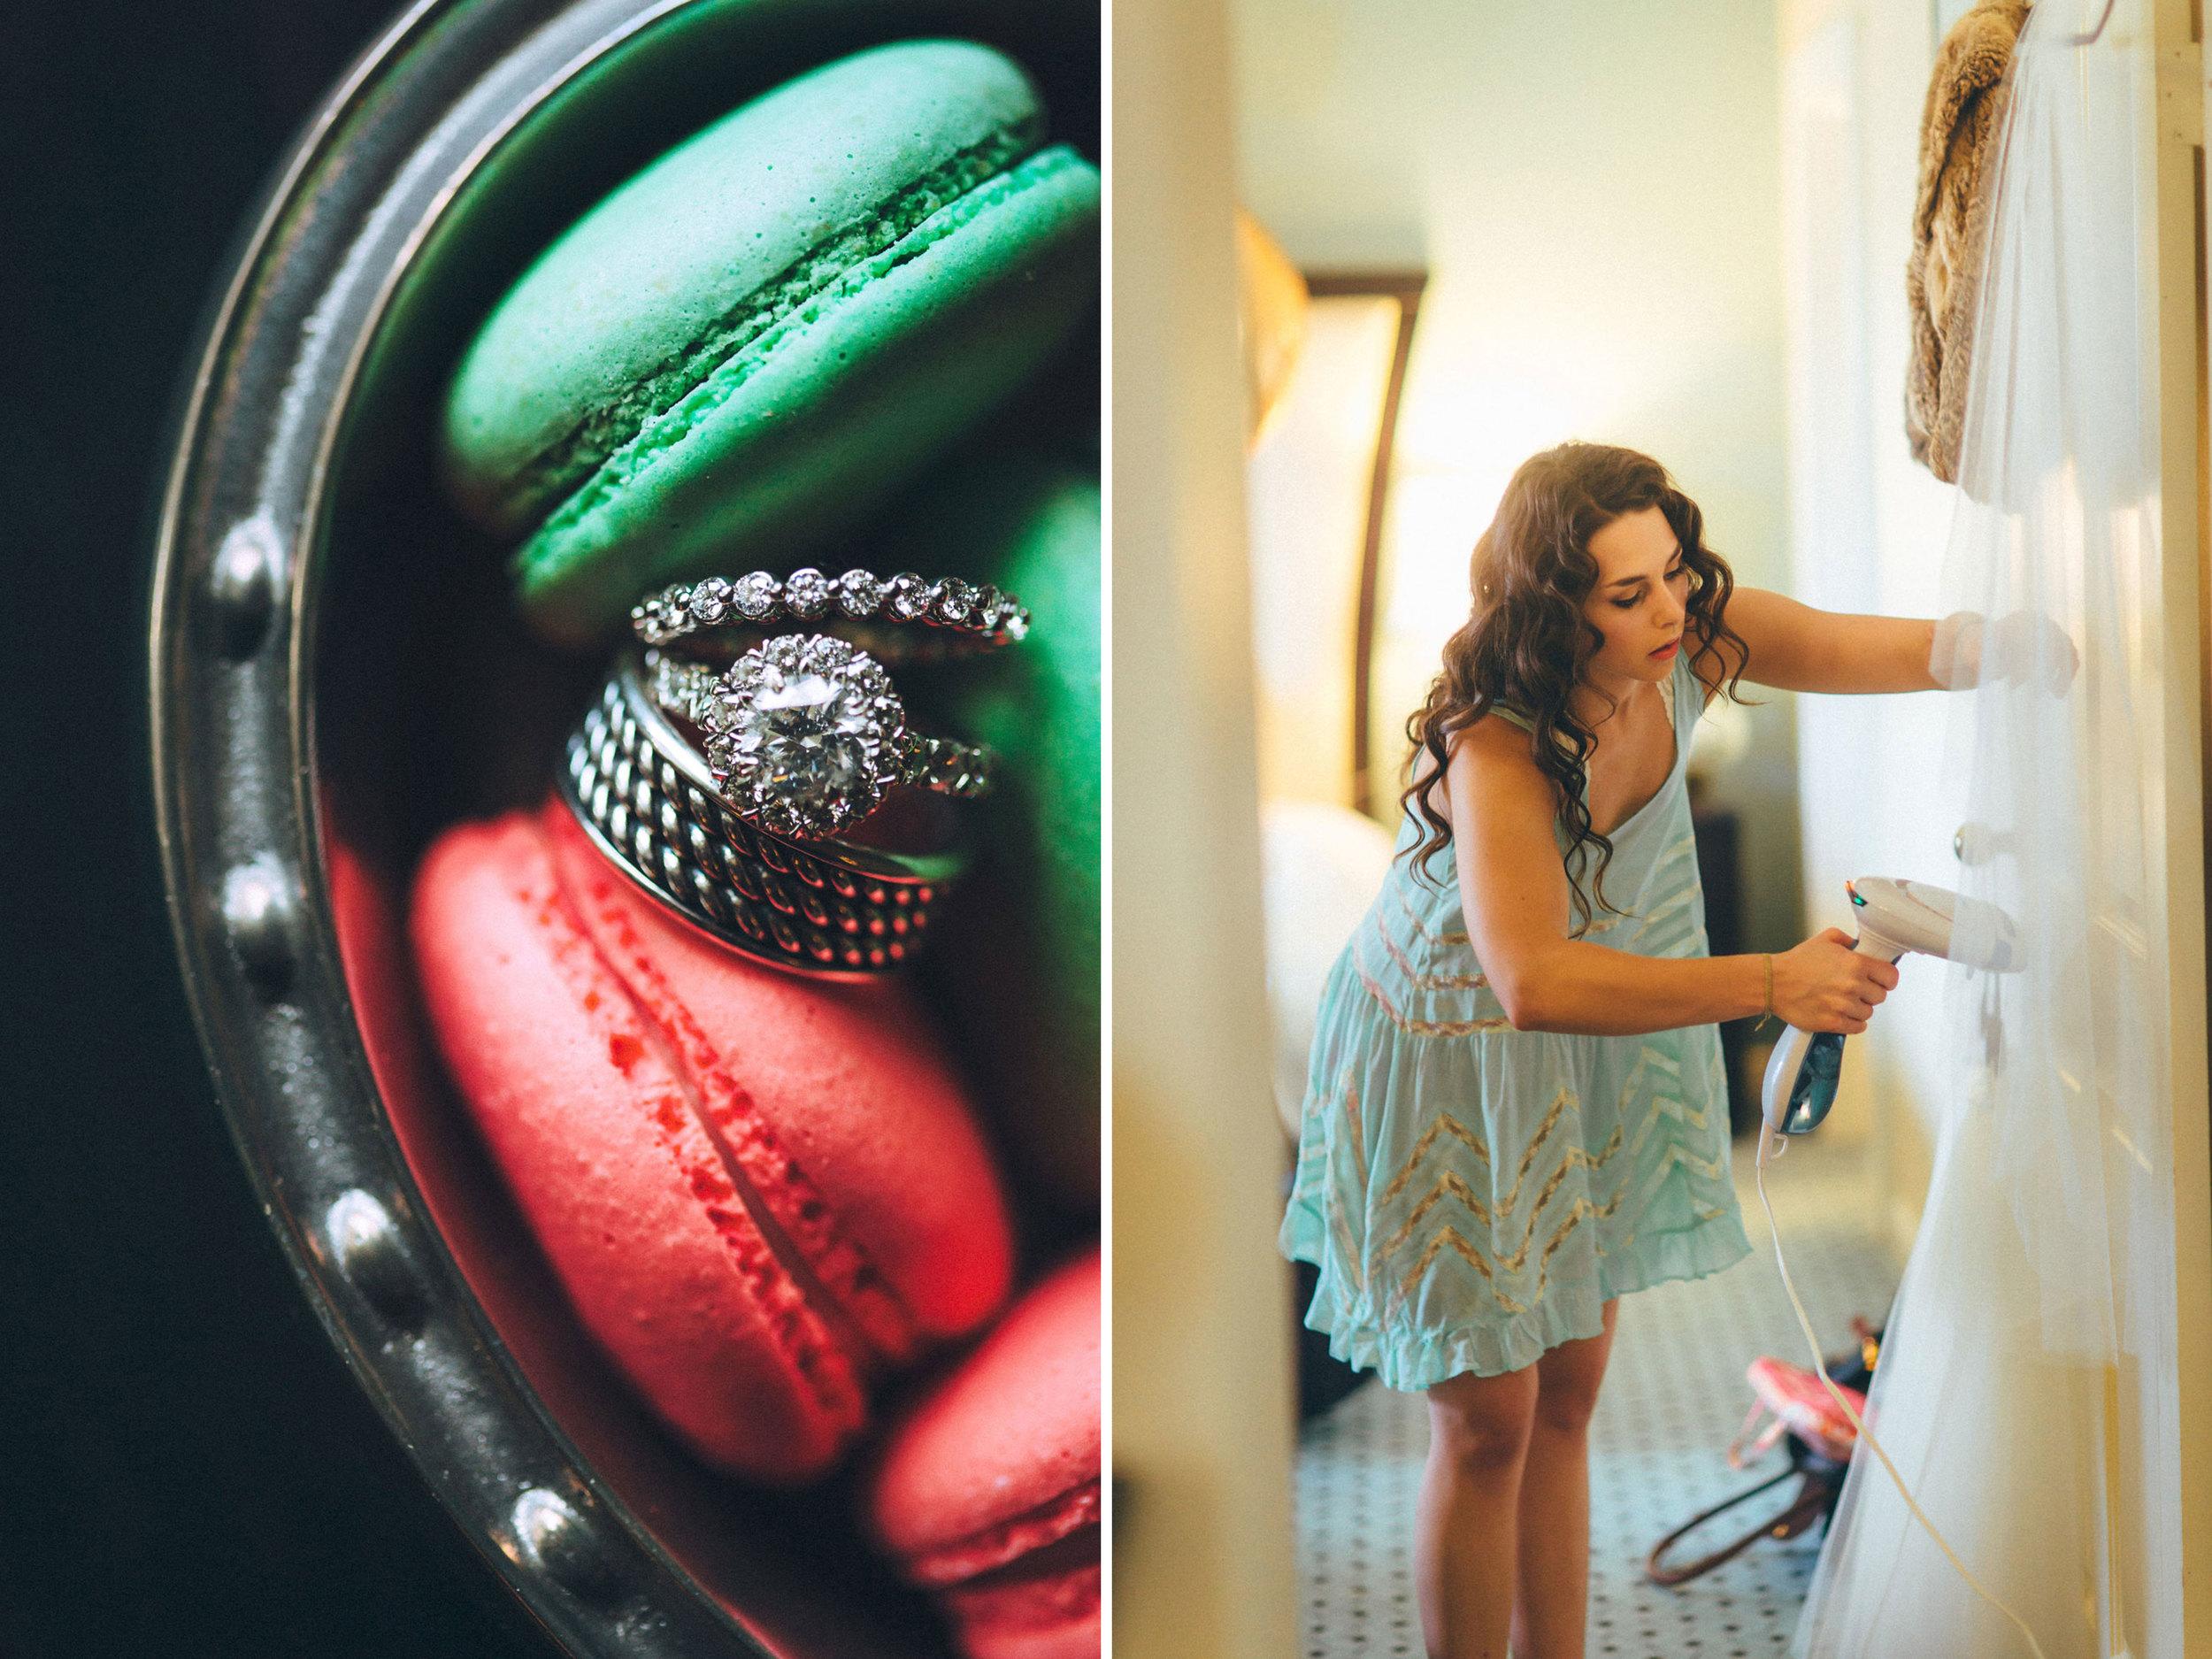 Me & Mr. Jones Wedding, Black Tie Wedding, Macaroons, Horseshoe Bowl, Nashville Wedding, Christopher Designs Engagement Ring, David Yurman Wedding Ring